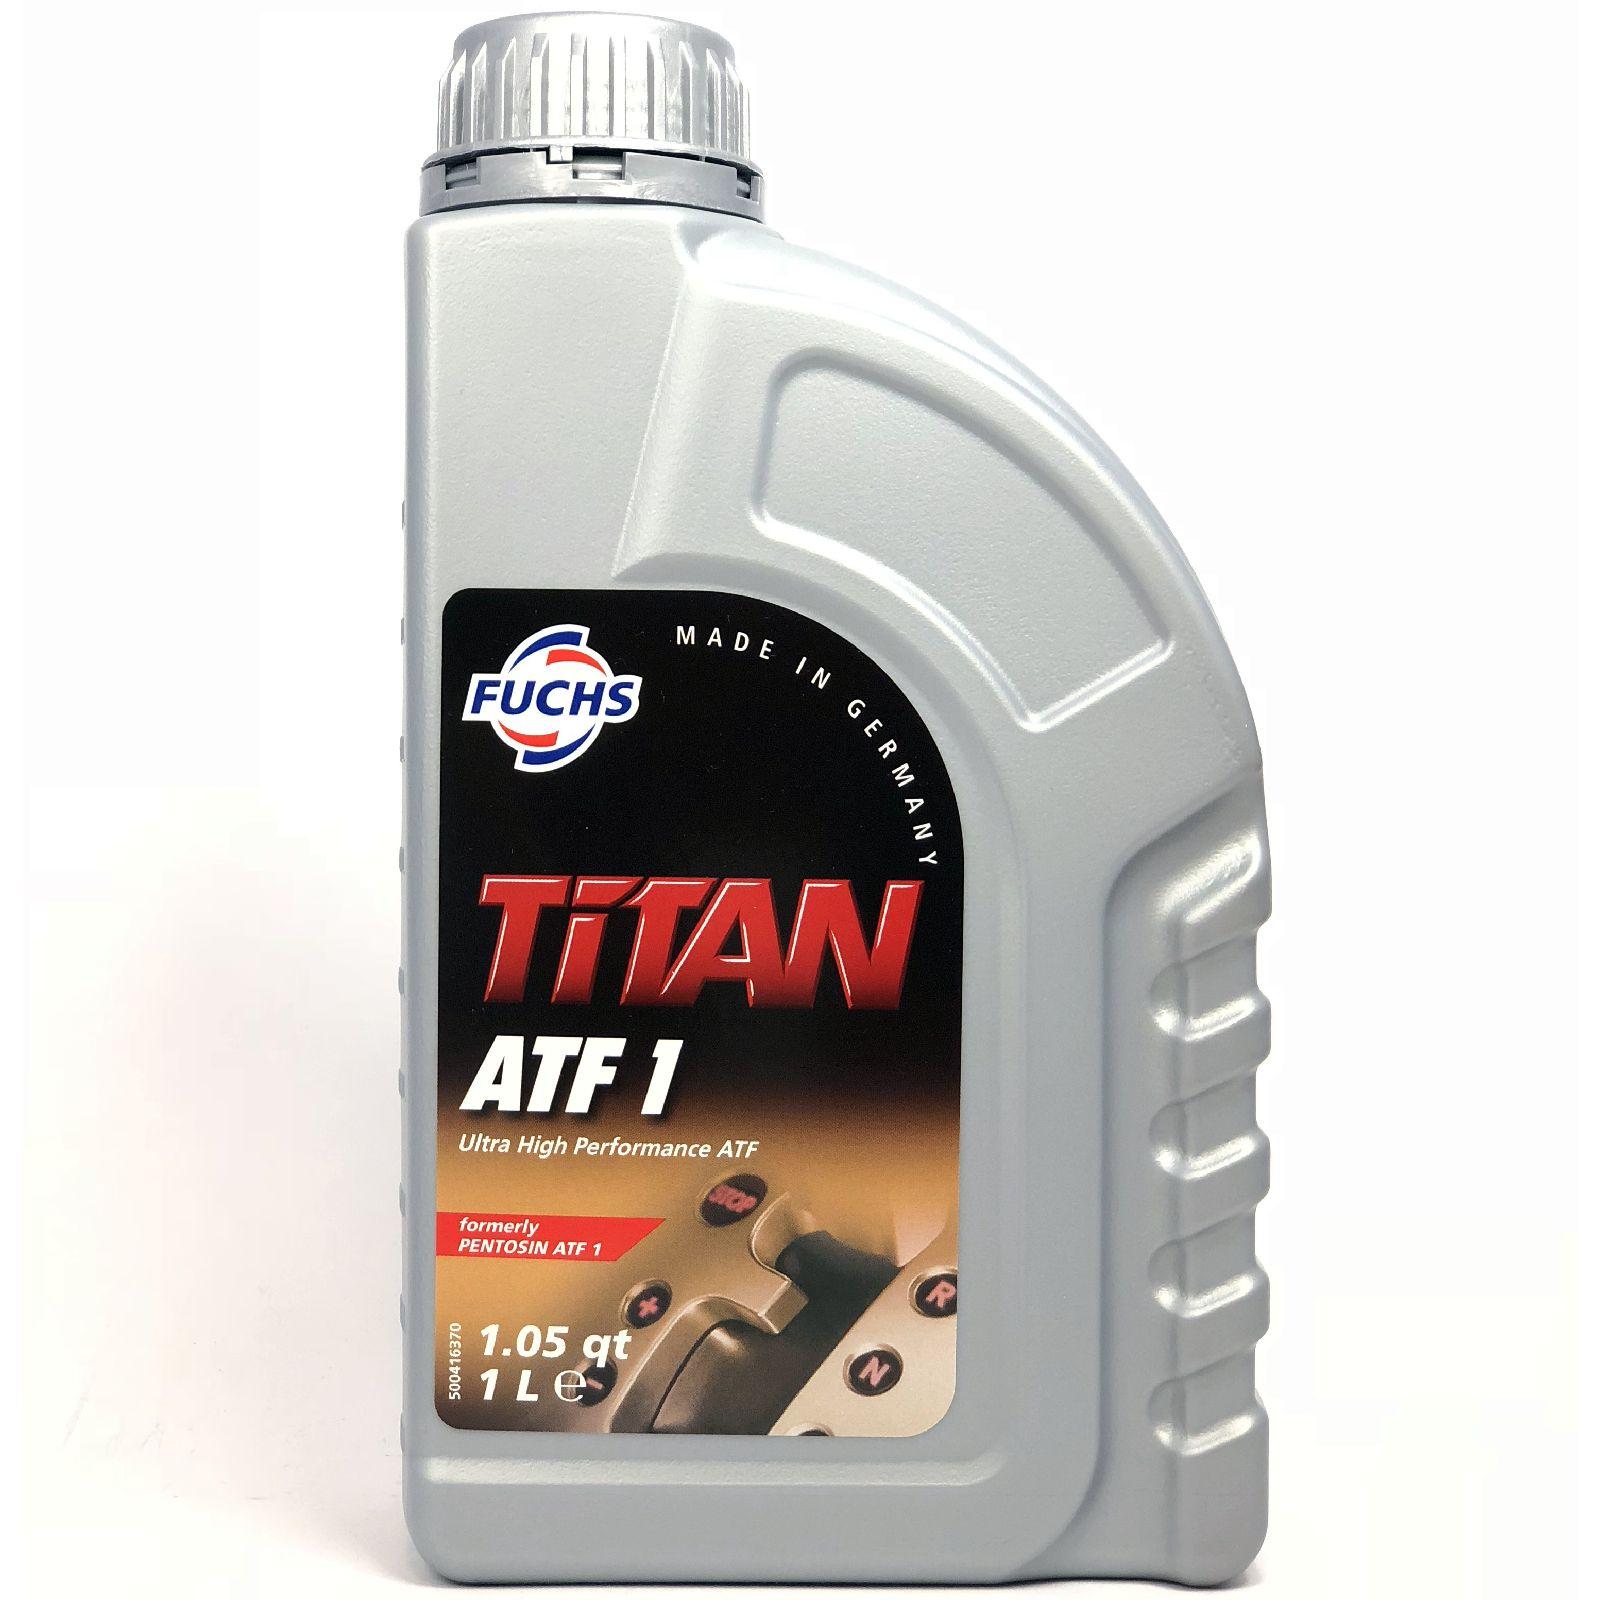 1 Liter FUCHS Titan ATF 1 / früher PENTOSIN ATF 1